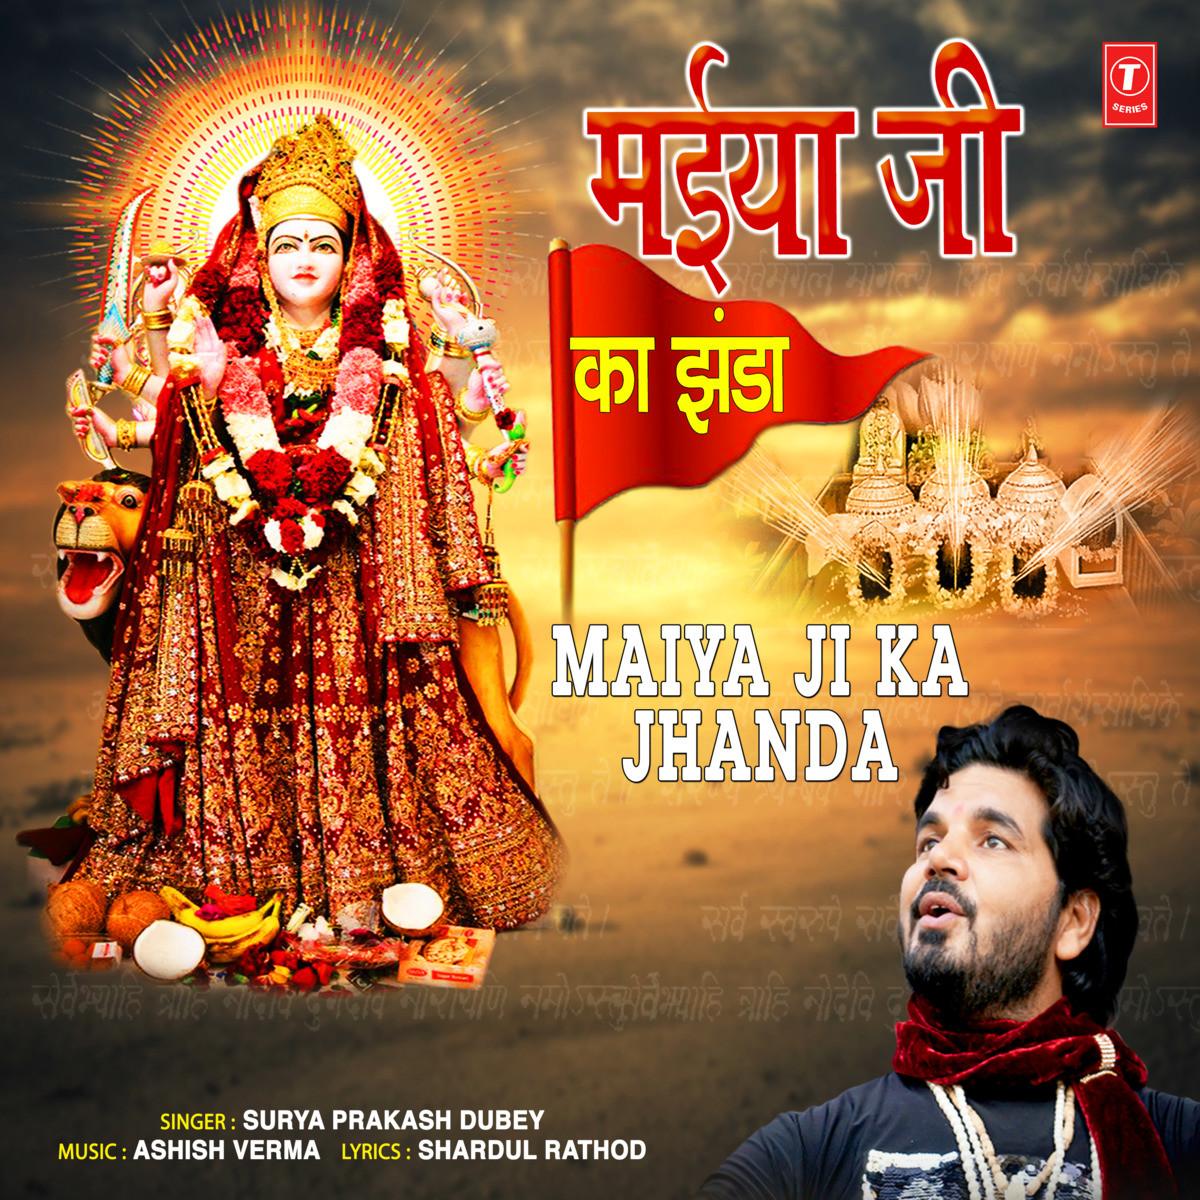 Maiya Ji Ka Jhanda Song Download Maiya Ji Ka Jhanda Mp3 Song Online Free On Gaana Com